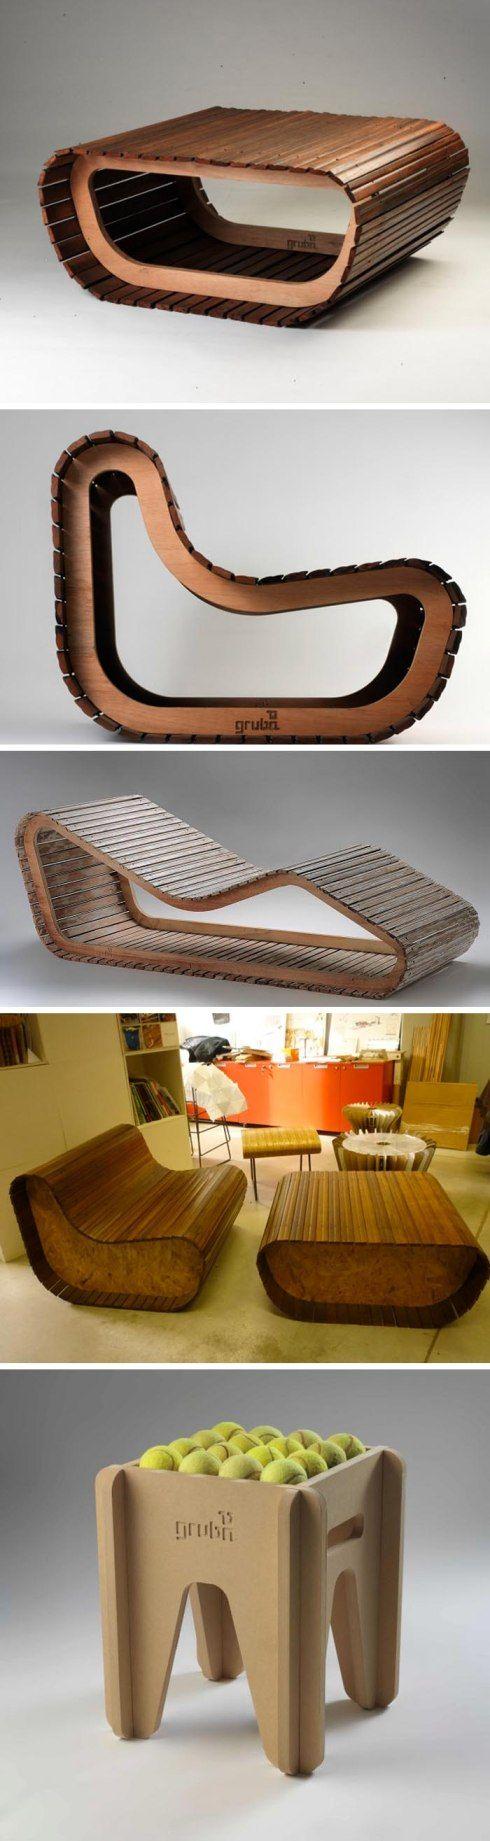 Gruba - Sustainable furniture design